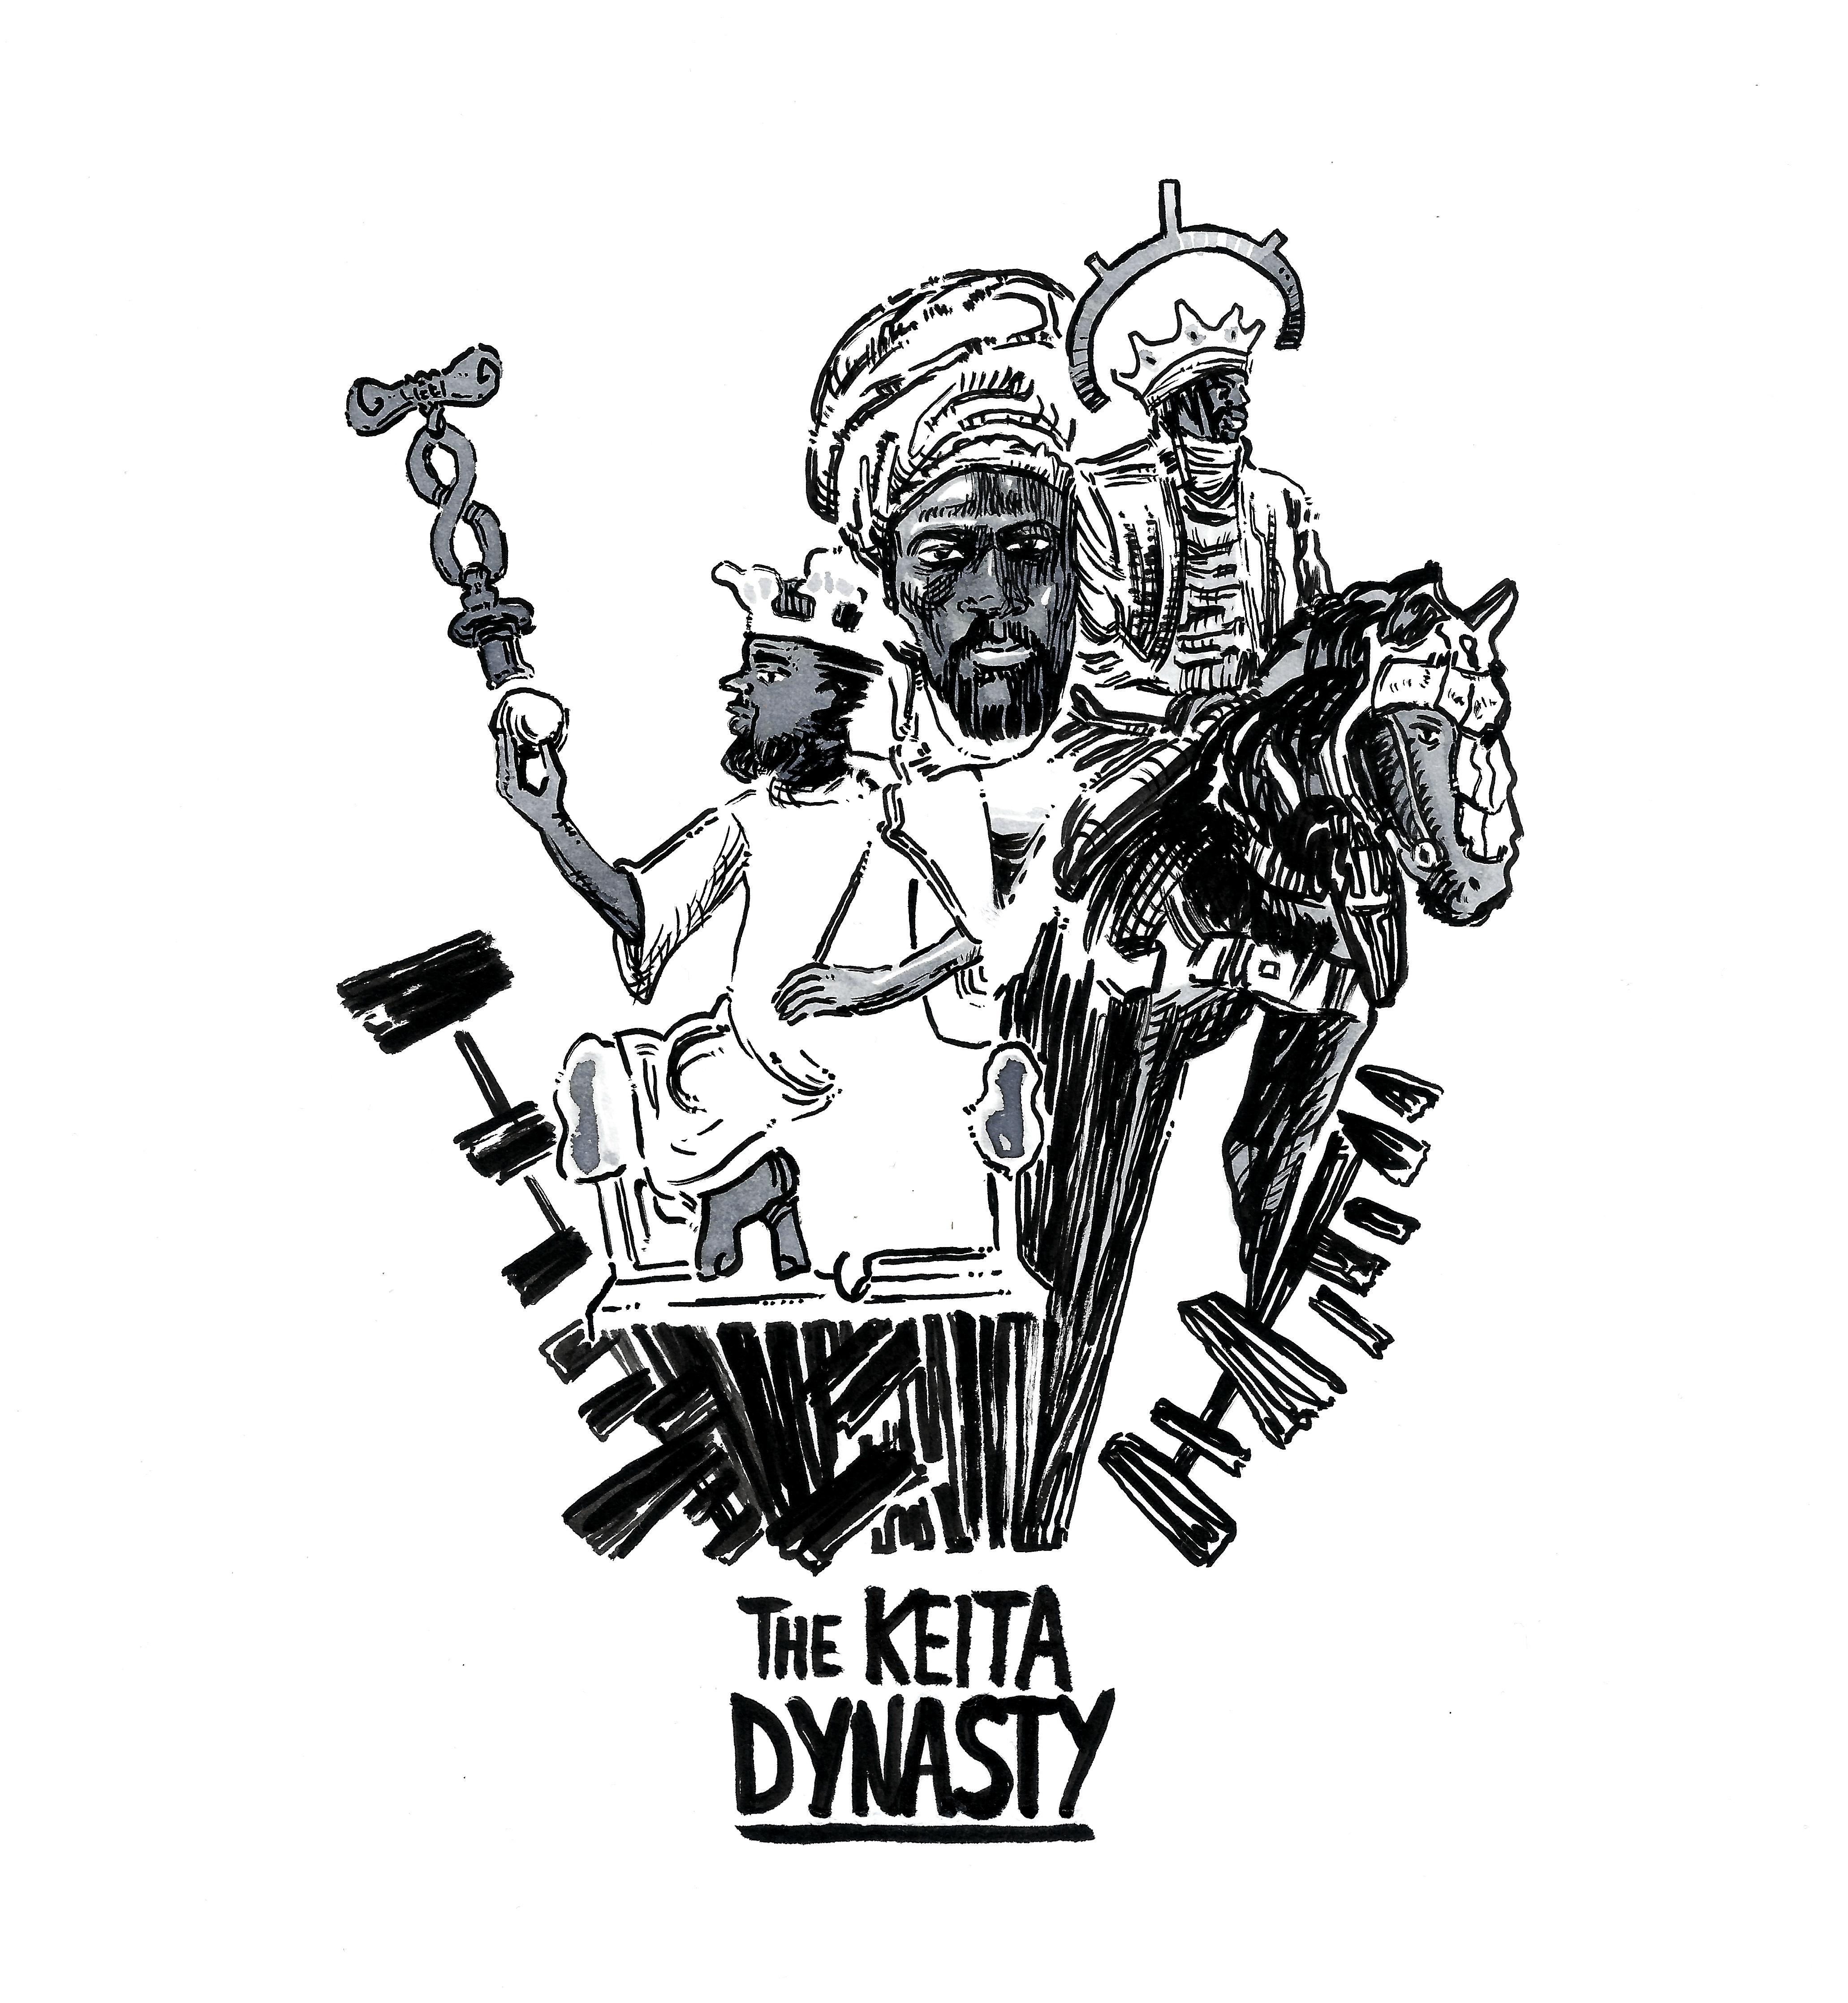 The Keita Dynasty